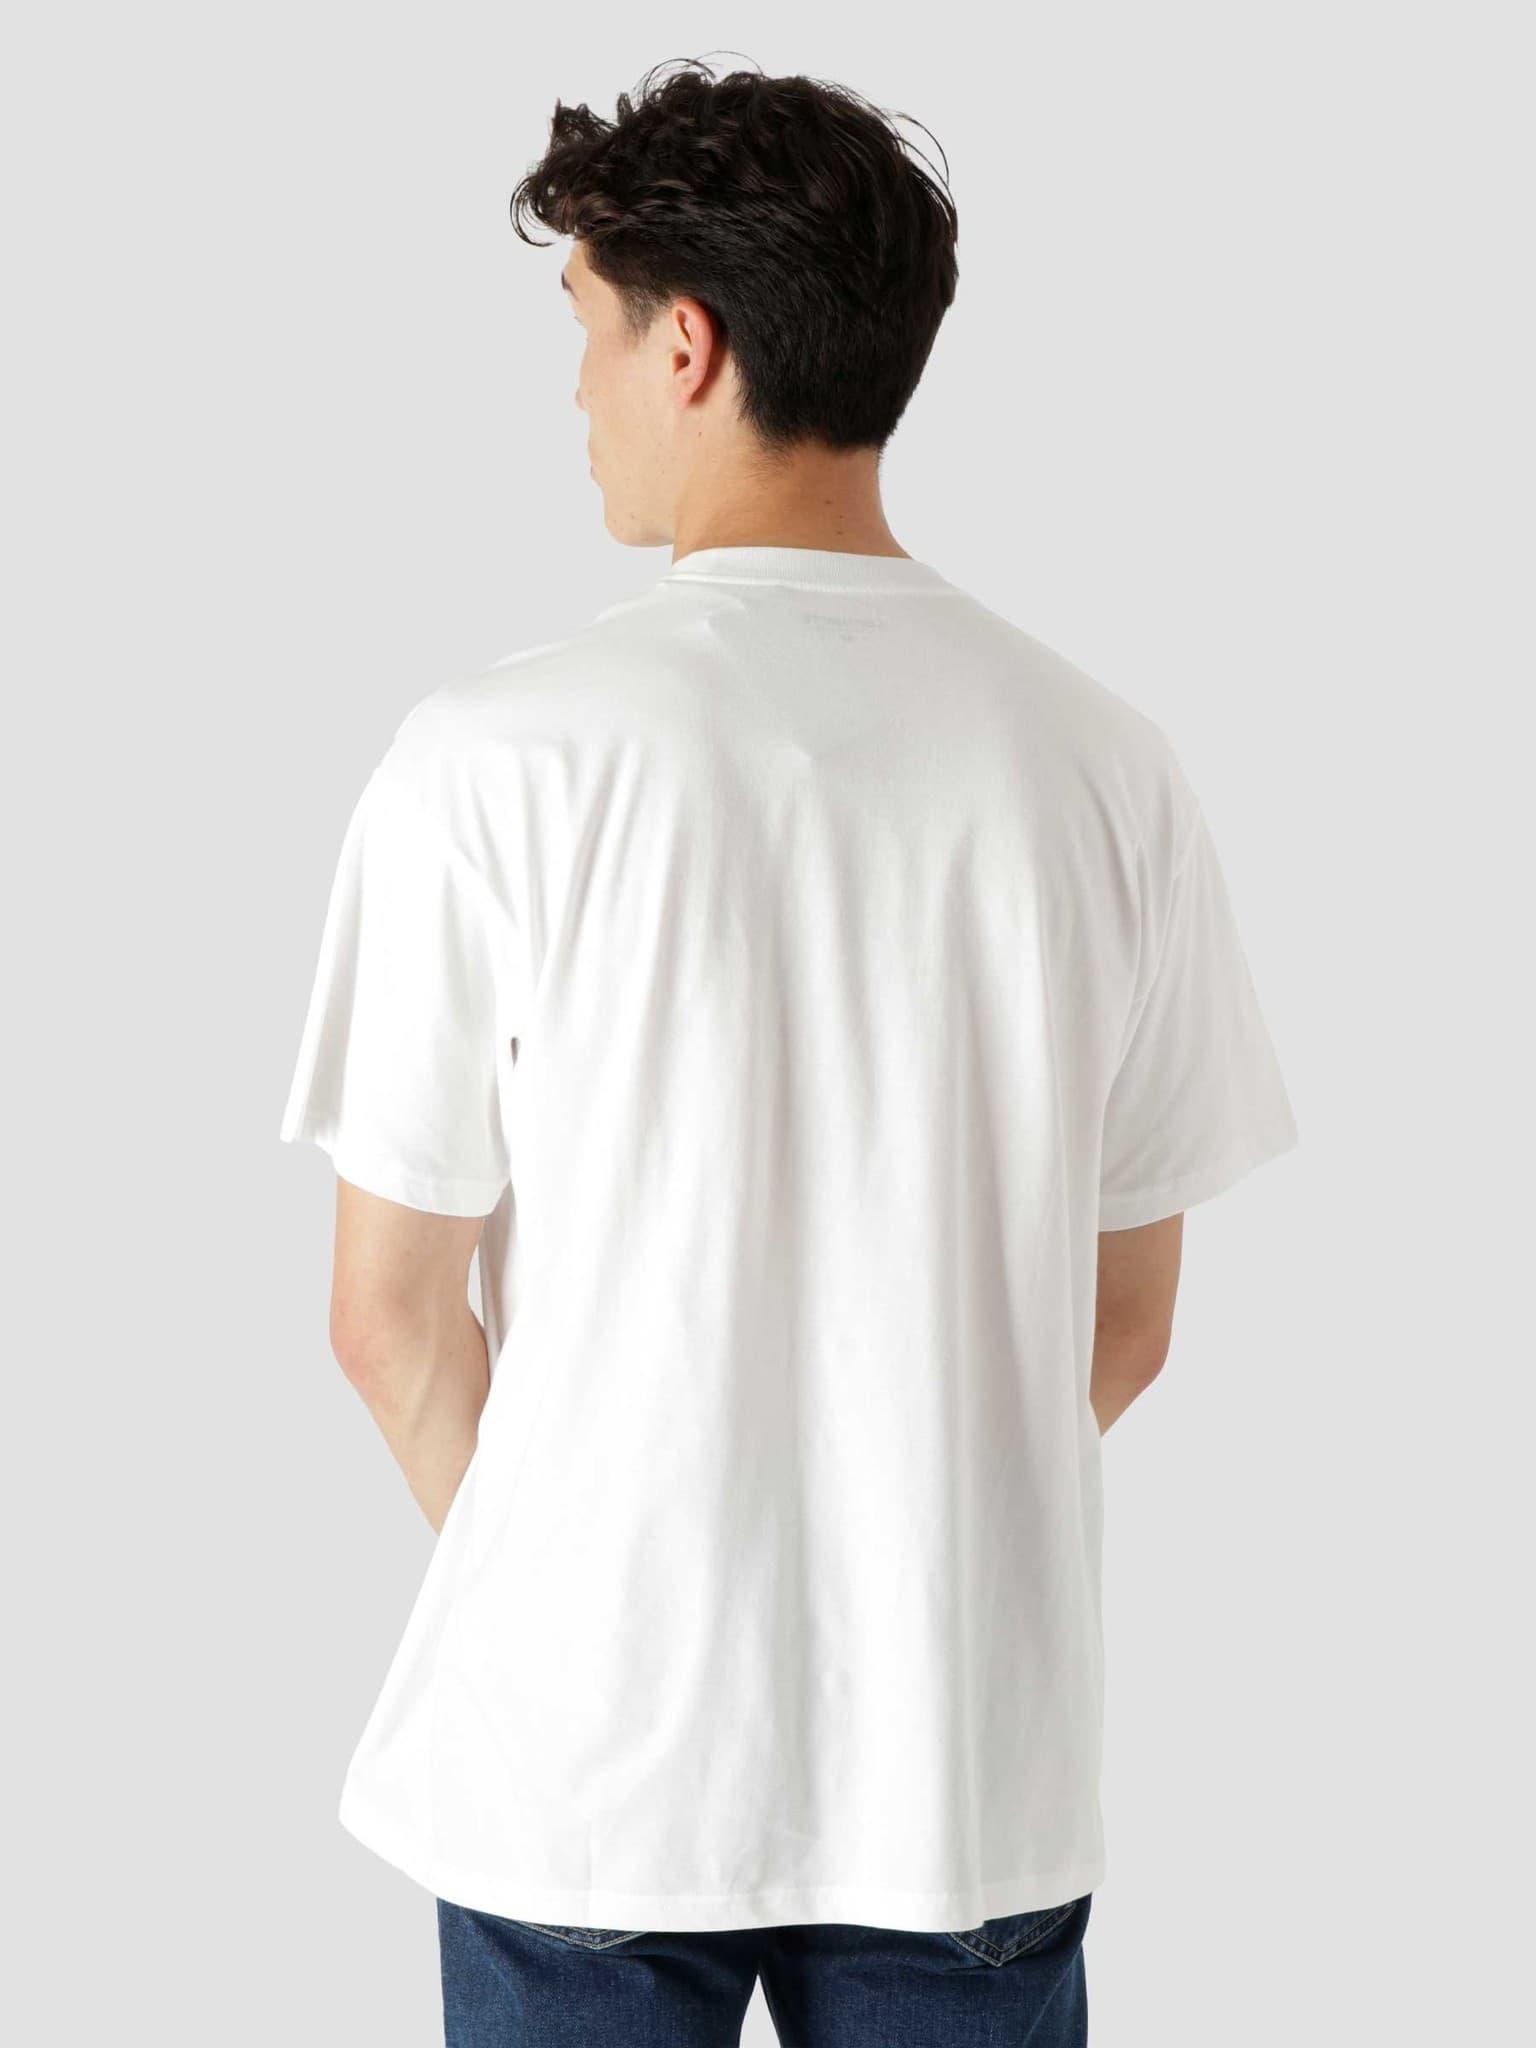 Chocolate Bar T-Shirt White I029620